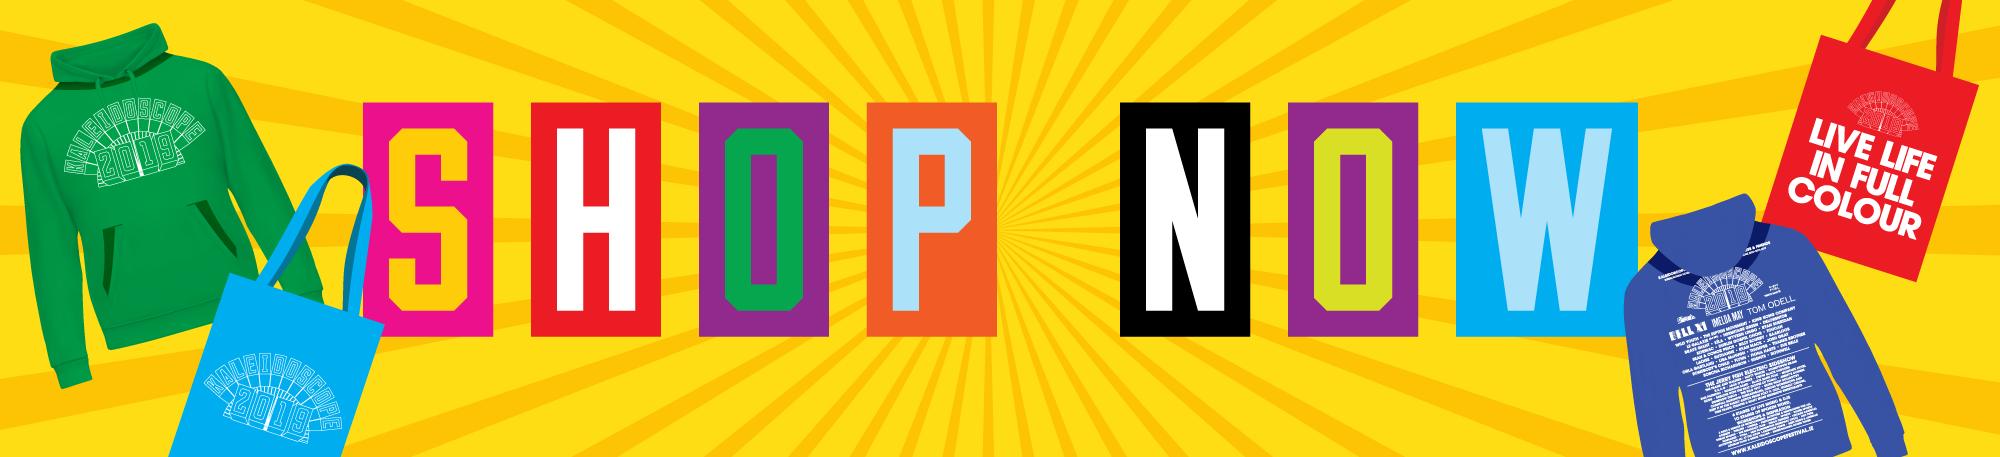 KScope-Website-ShopNow-Banner.png